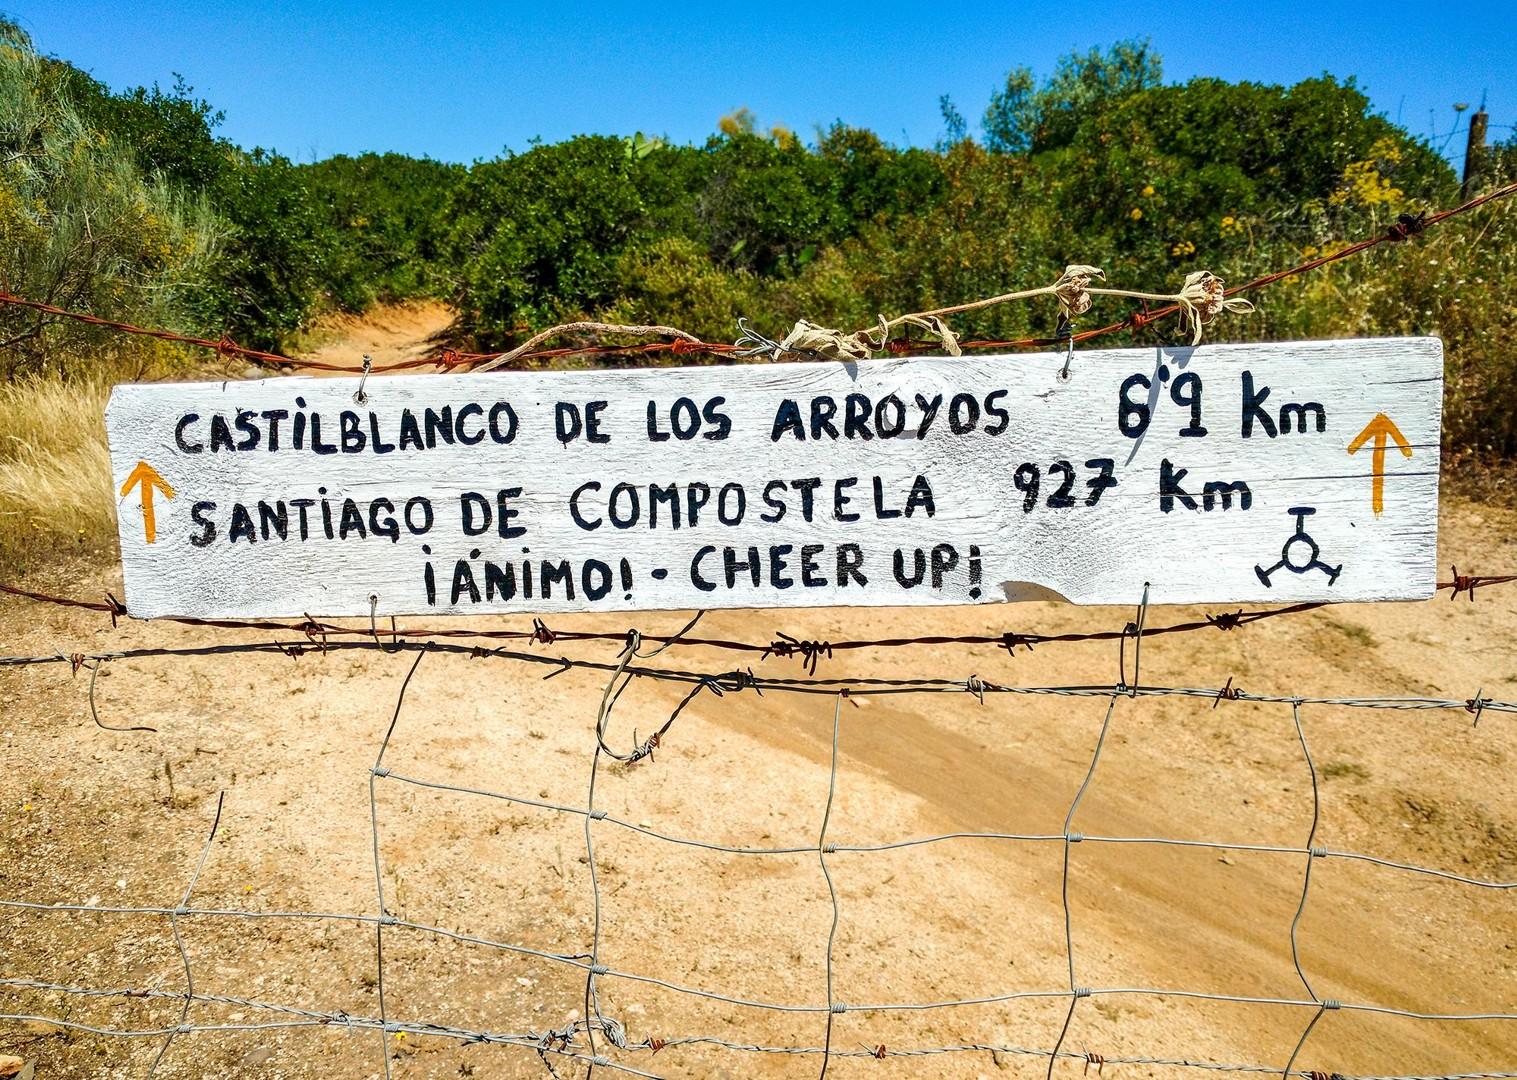 IMG_20170507_130313060.jpg - Spain - Ruta de la Plata - Guided Mountain Bike Holiday - Mountain Biking